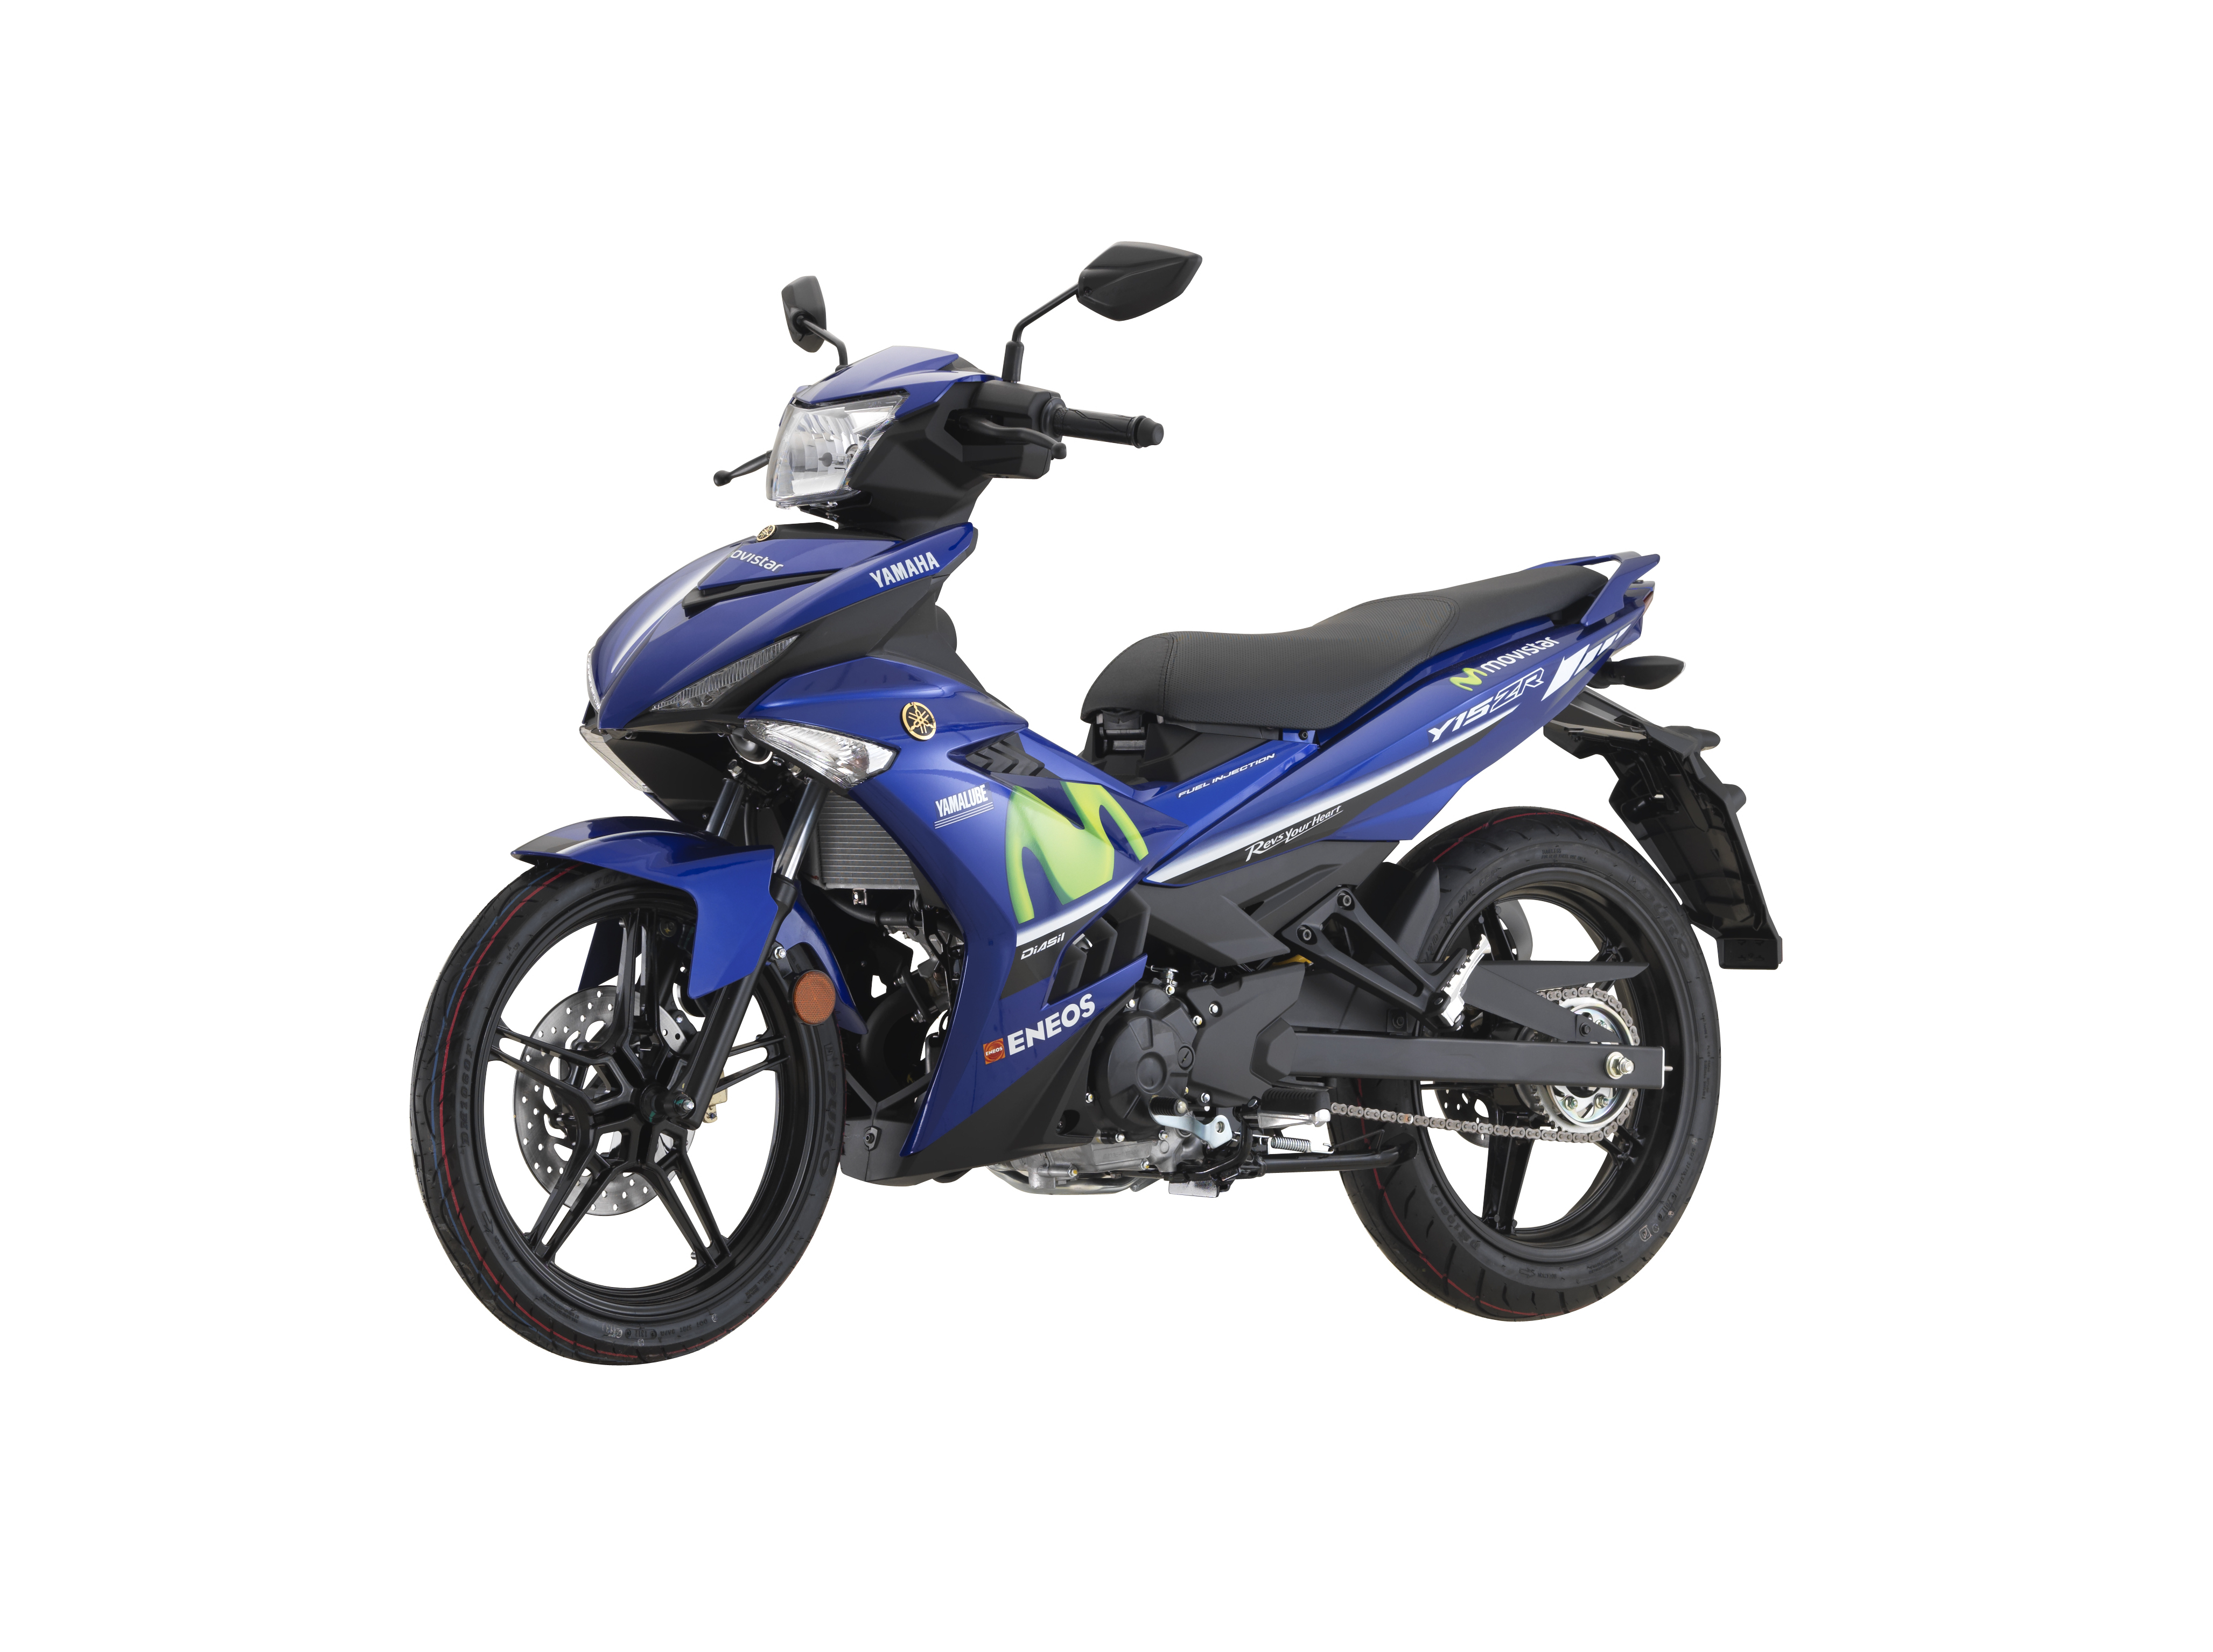 2018 Yamaha Y15ZR SE GP Edition released - RM8,891